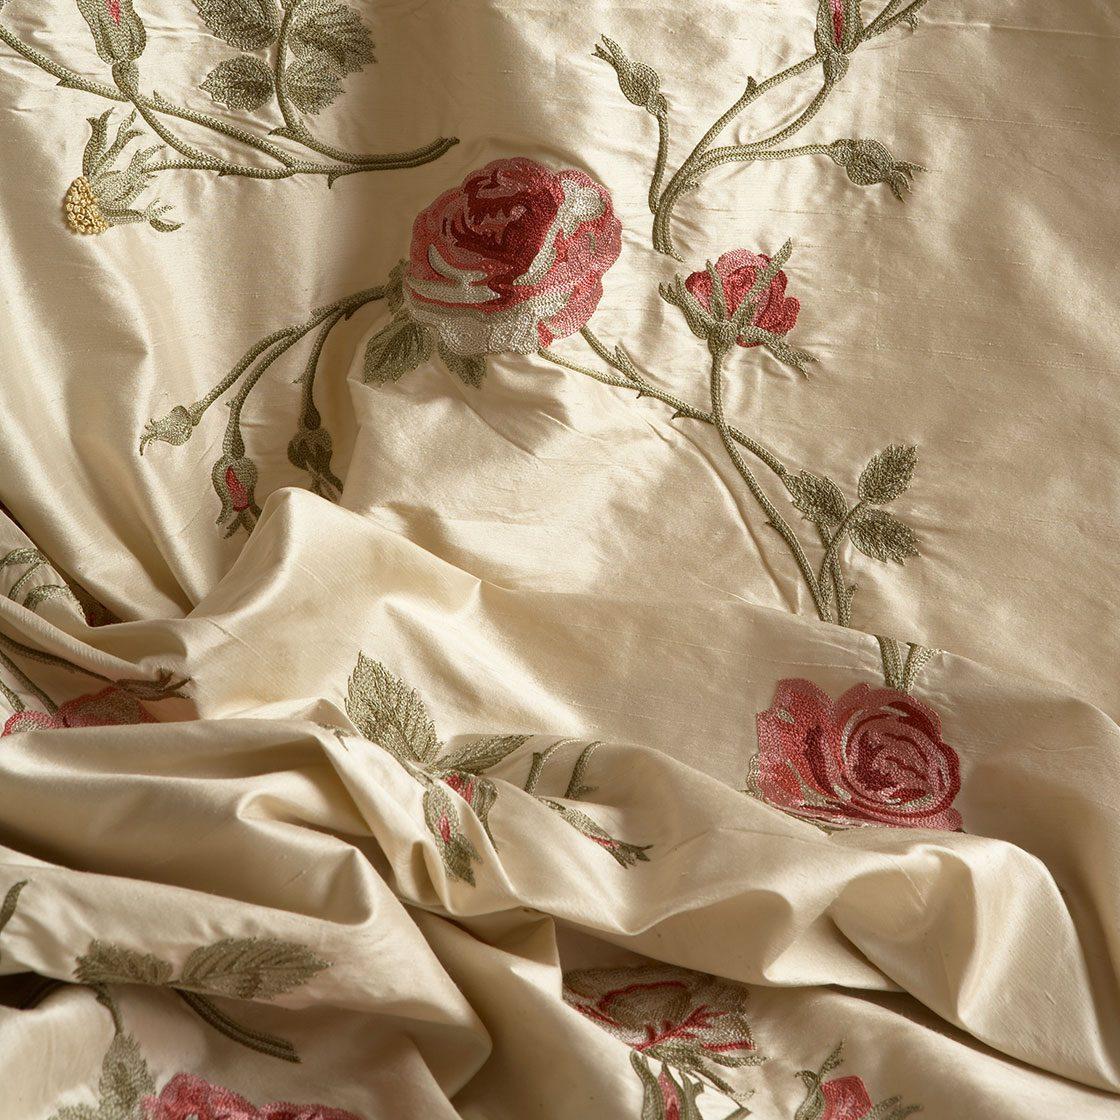 Rosewalk - On Plain Silk Alabaster - Beaumont & Fletcher - Beaumont & Fletcher